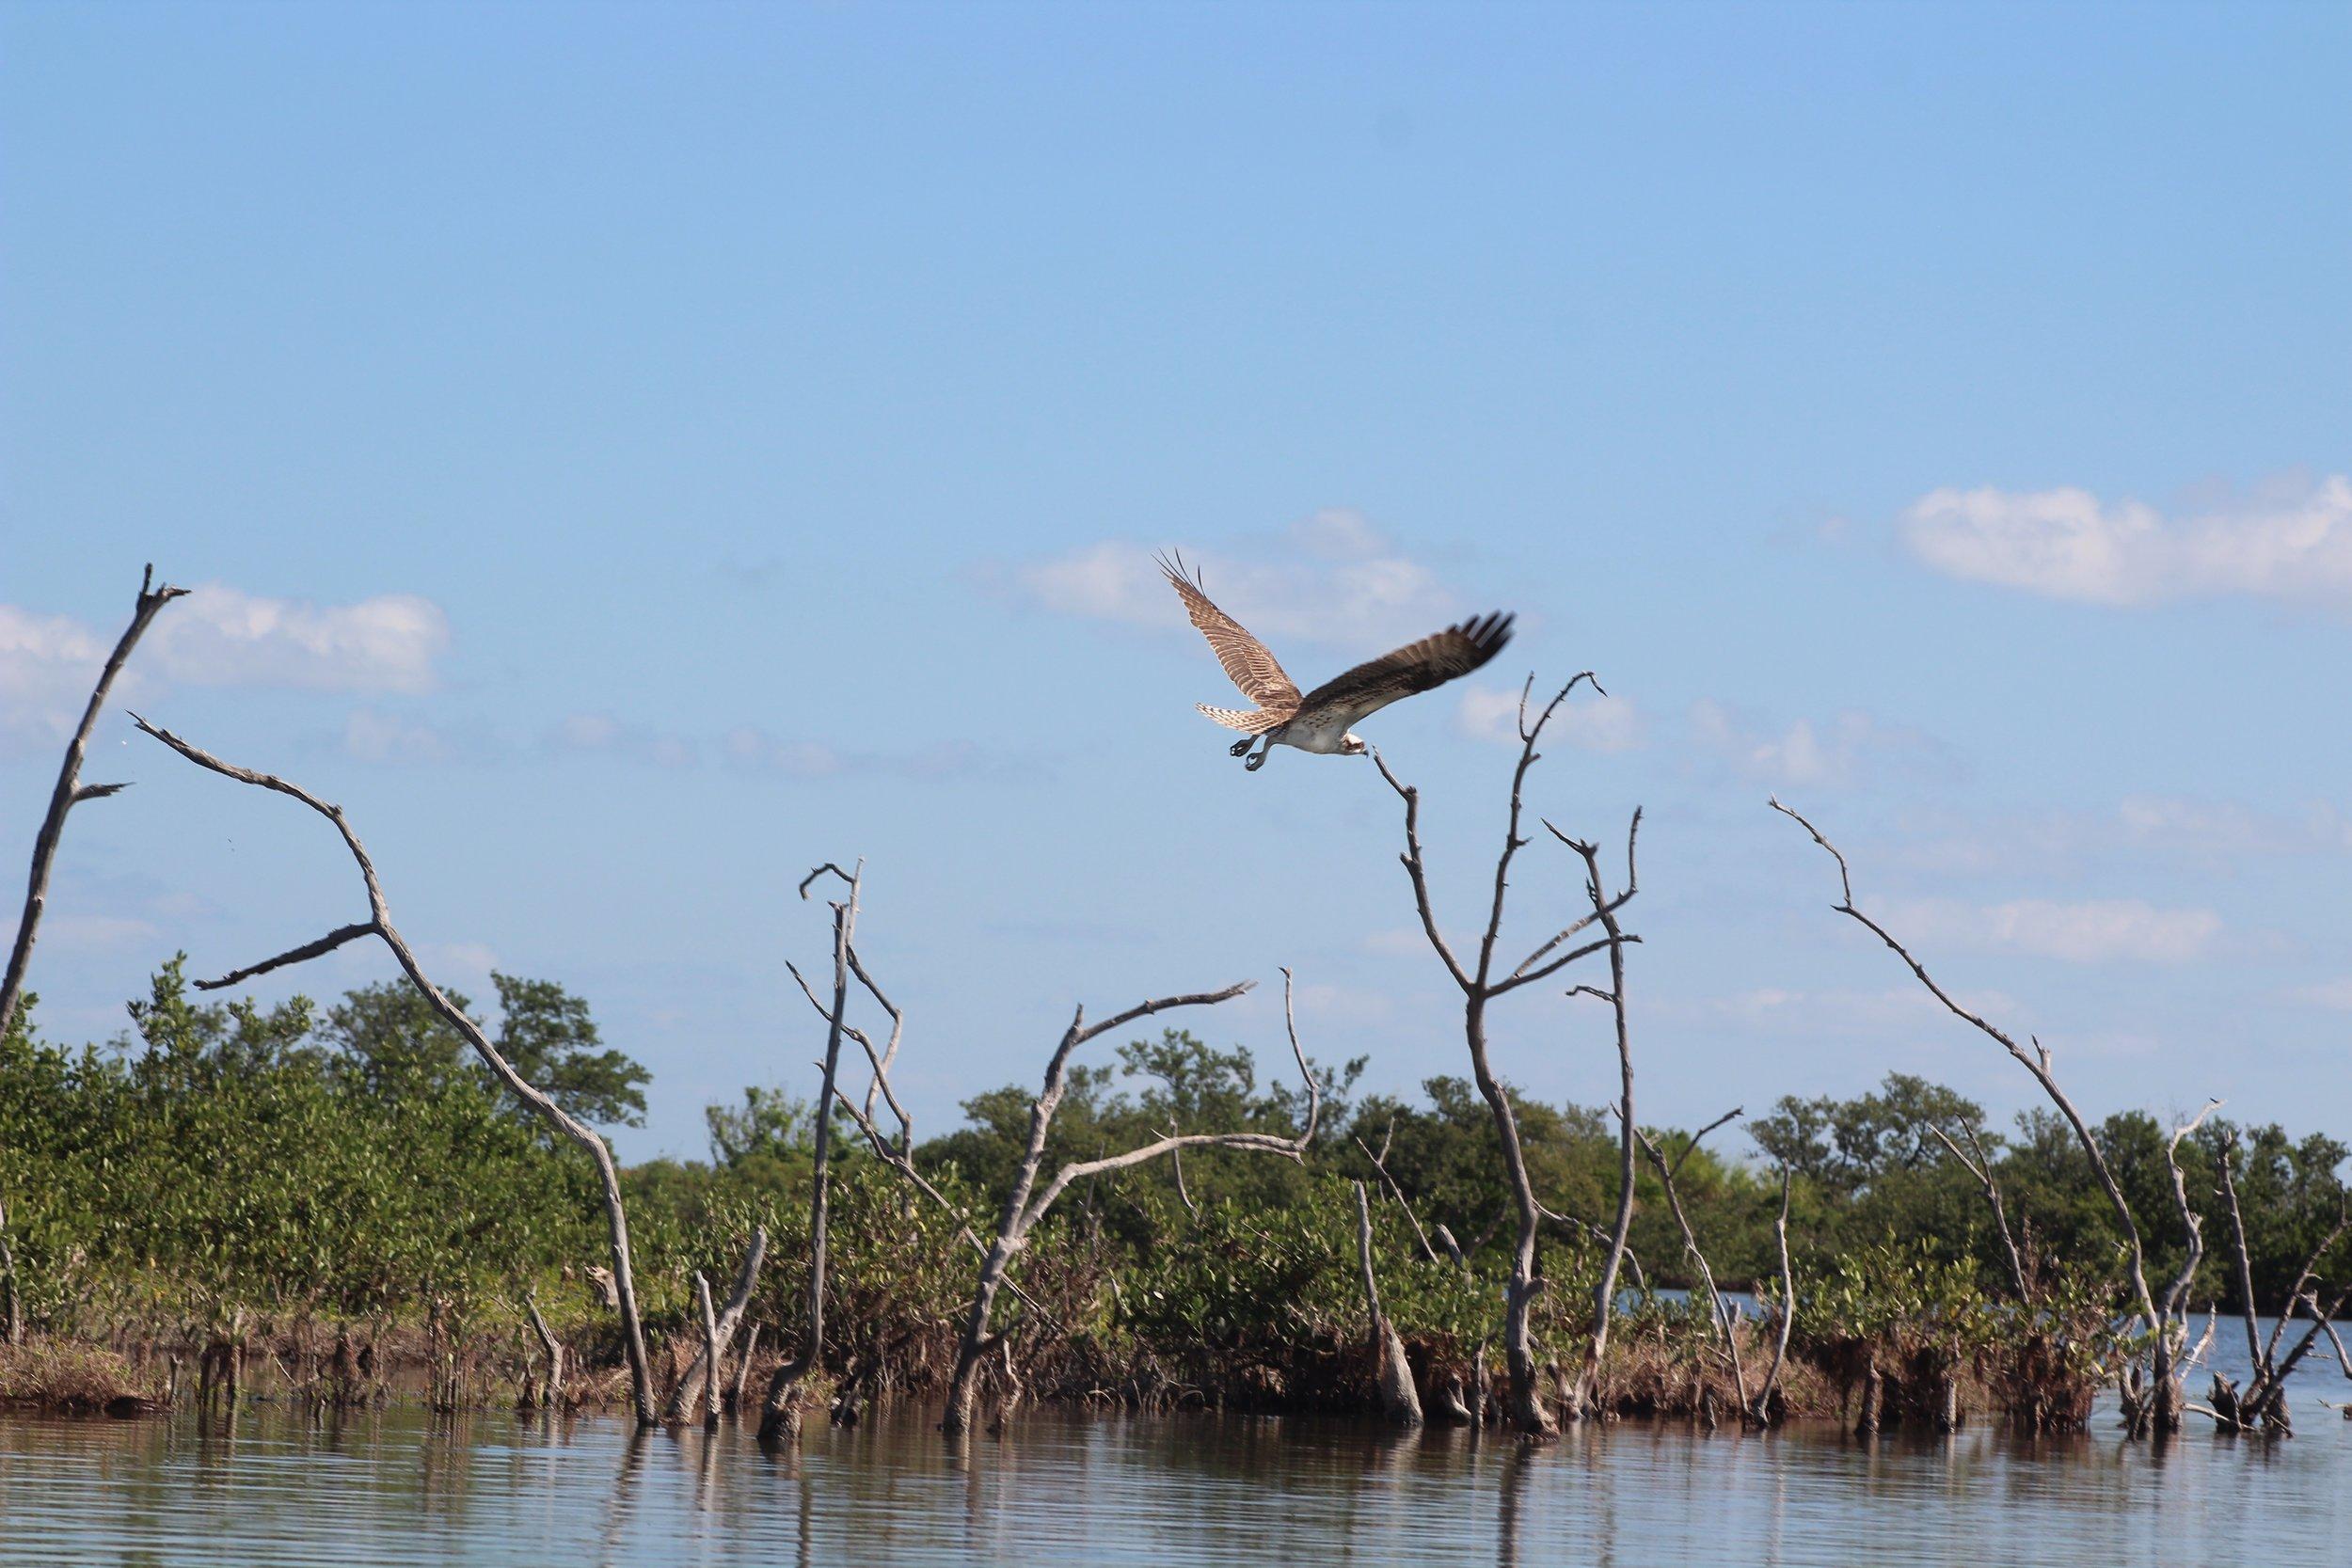 Osprey in Mosquito Lagoon